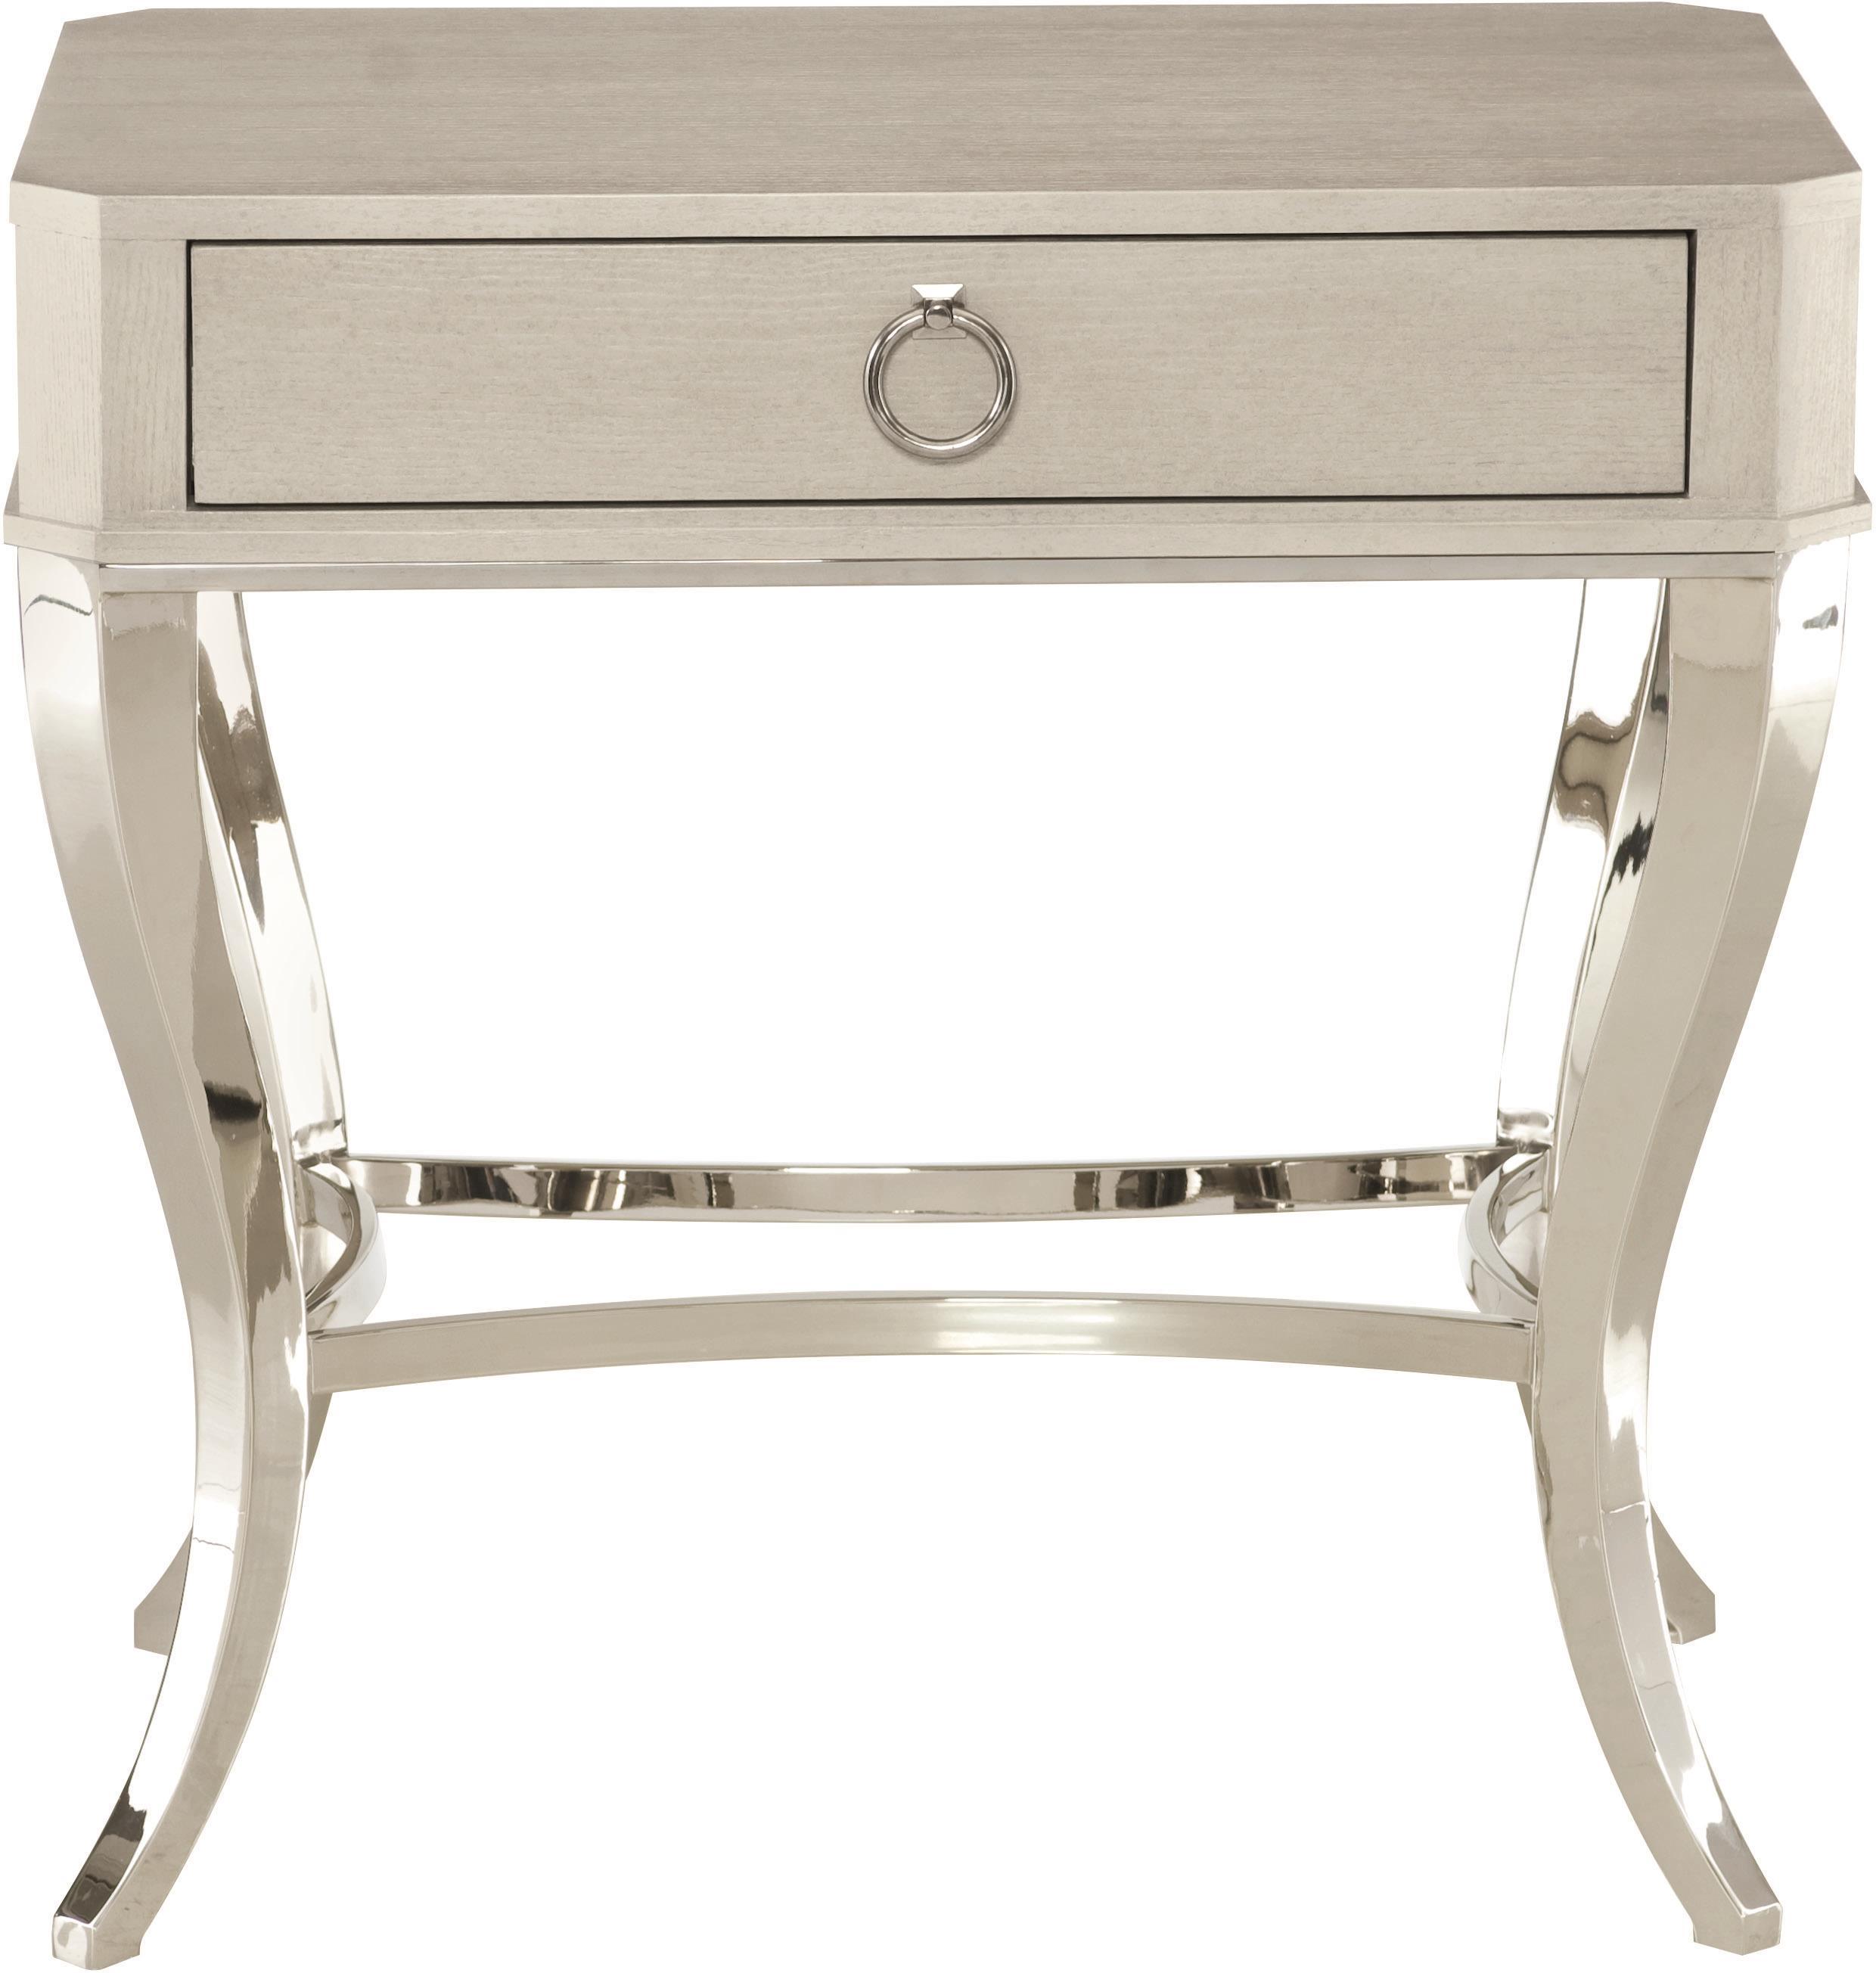 Bernhardt Criteria 363 217g Nightstand With Cabriole Legs Baer 39 S Furniture Night Stands